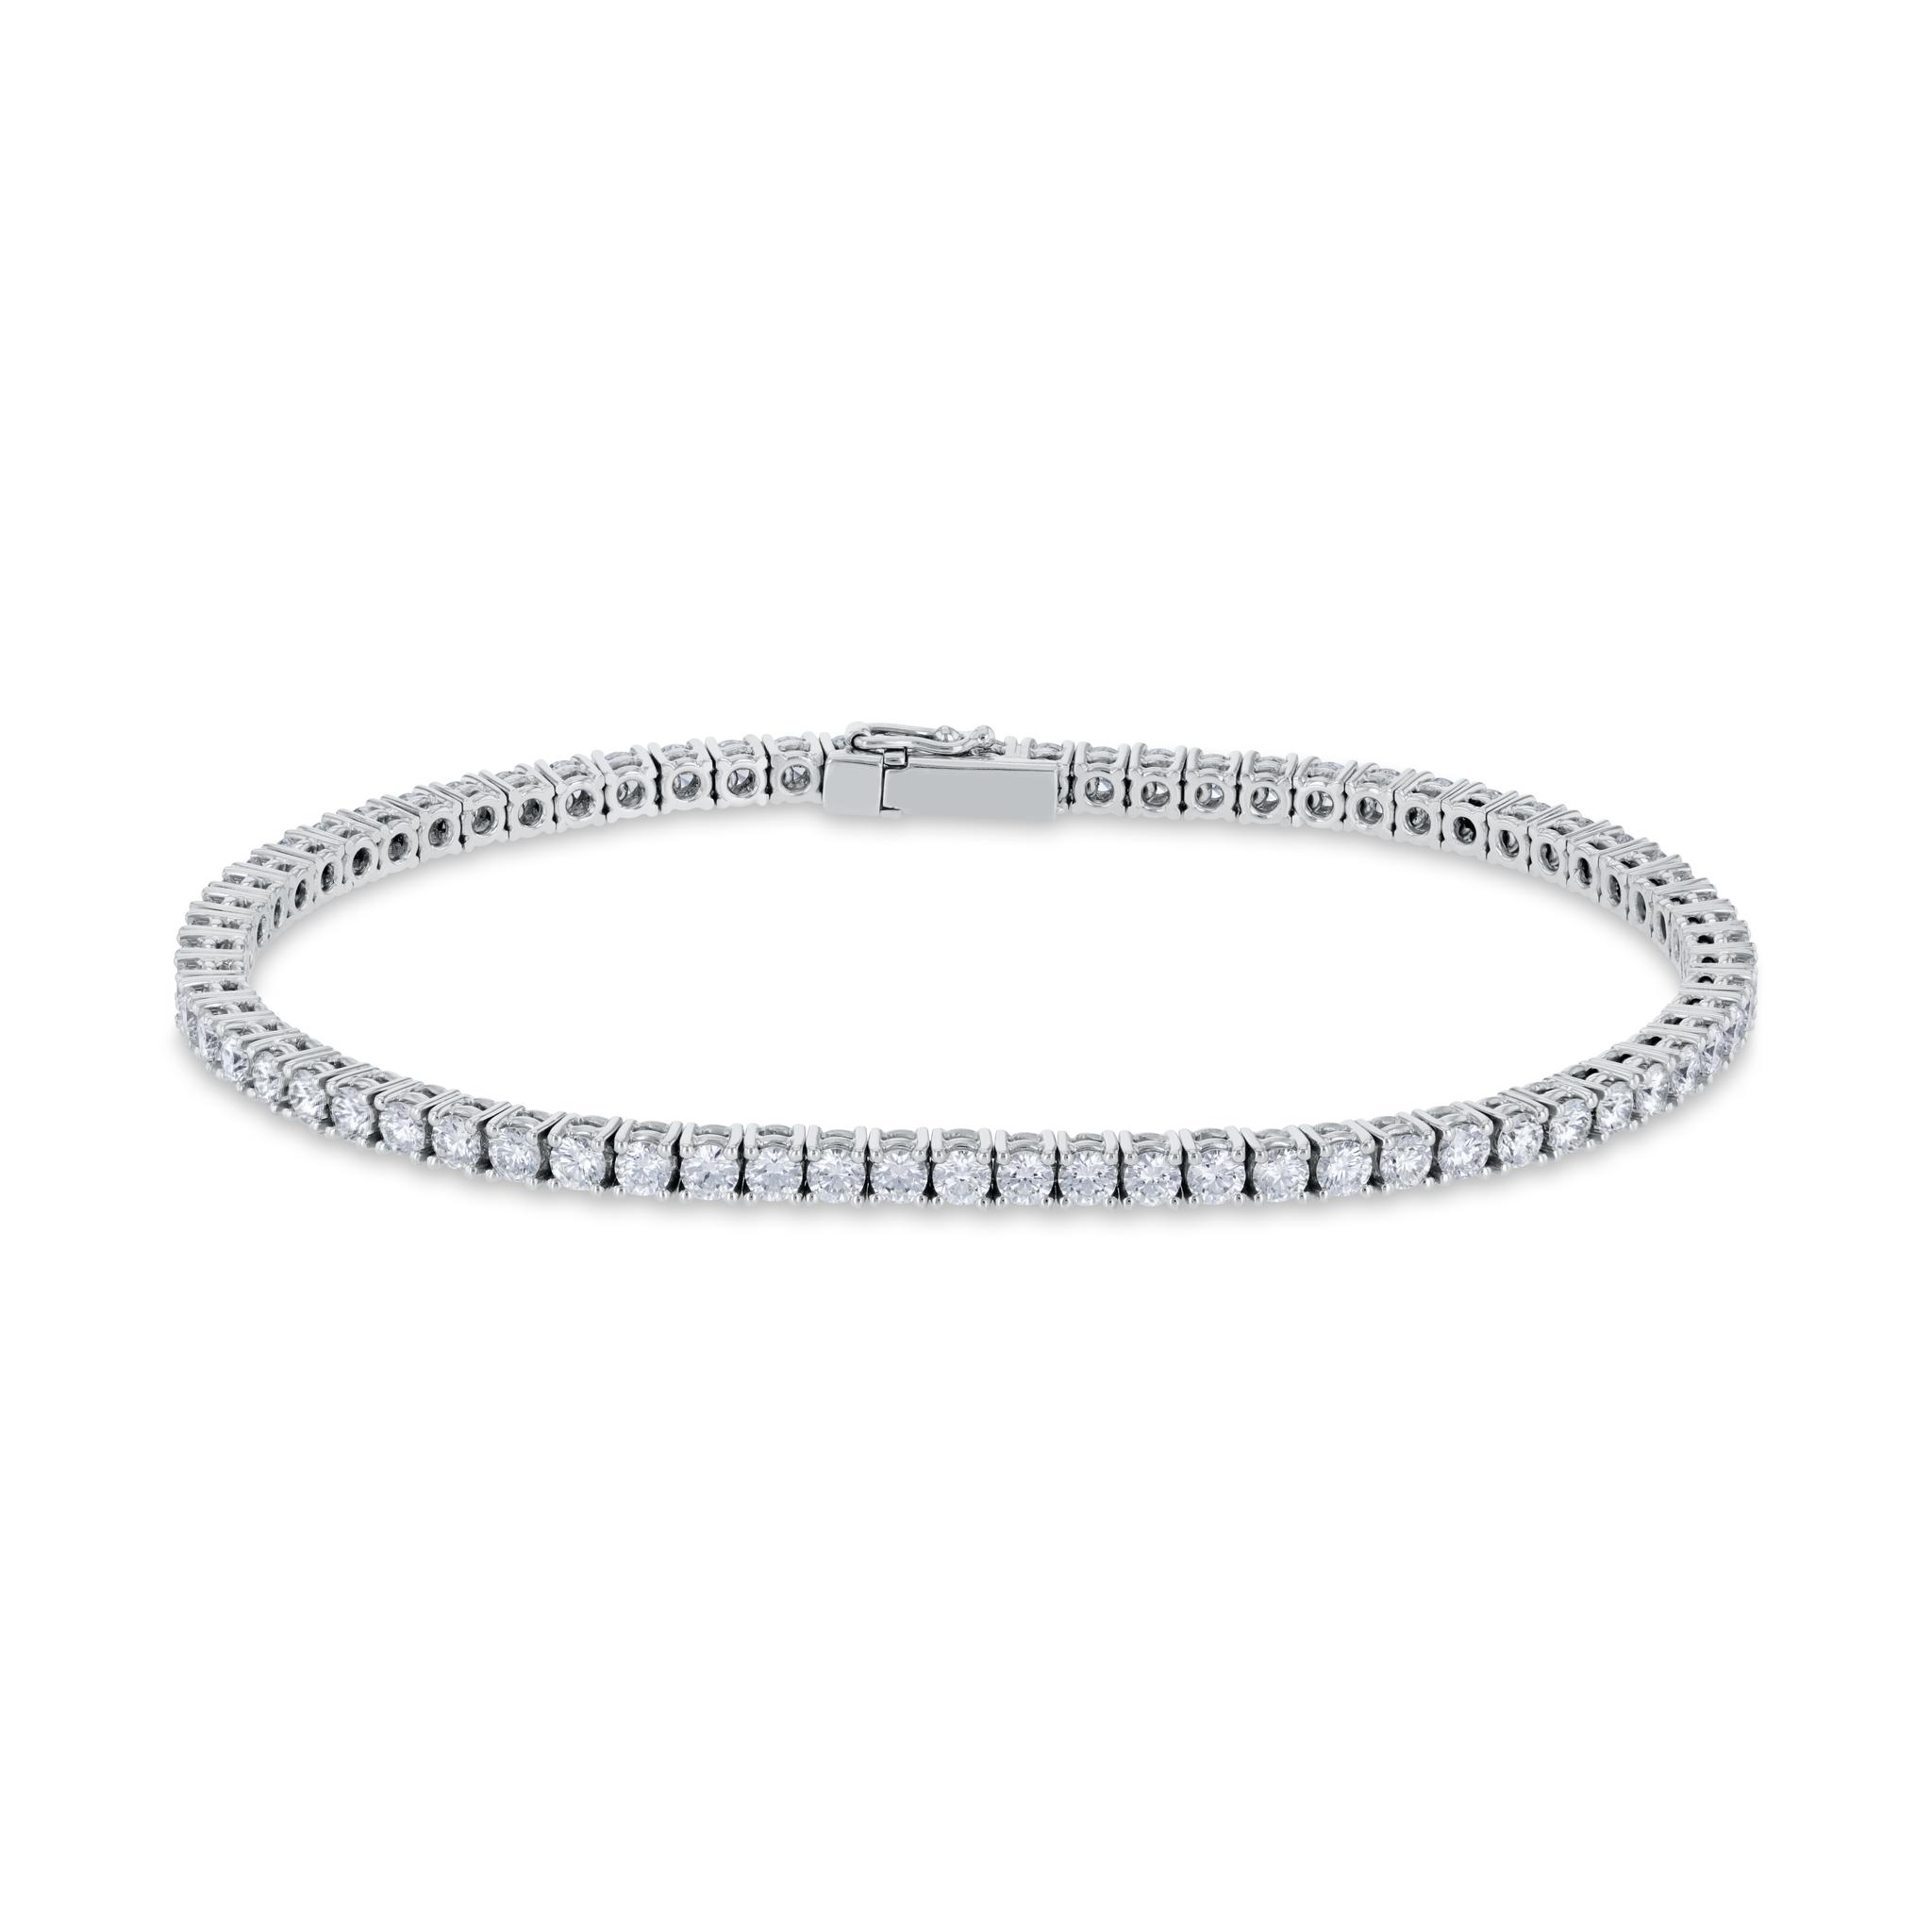 Rivière Armband mit Diamanten